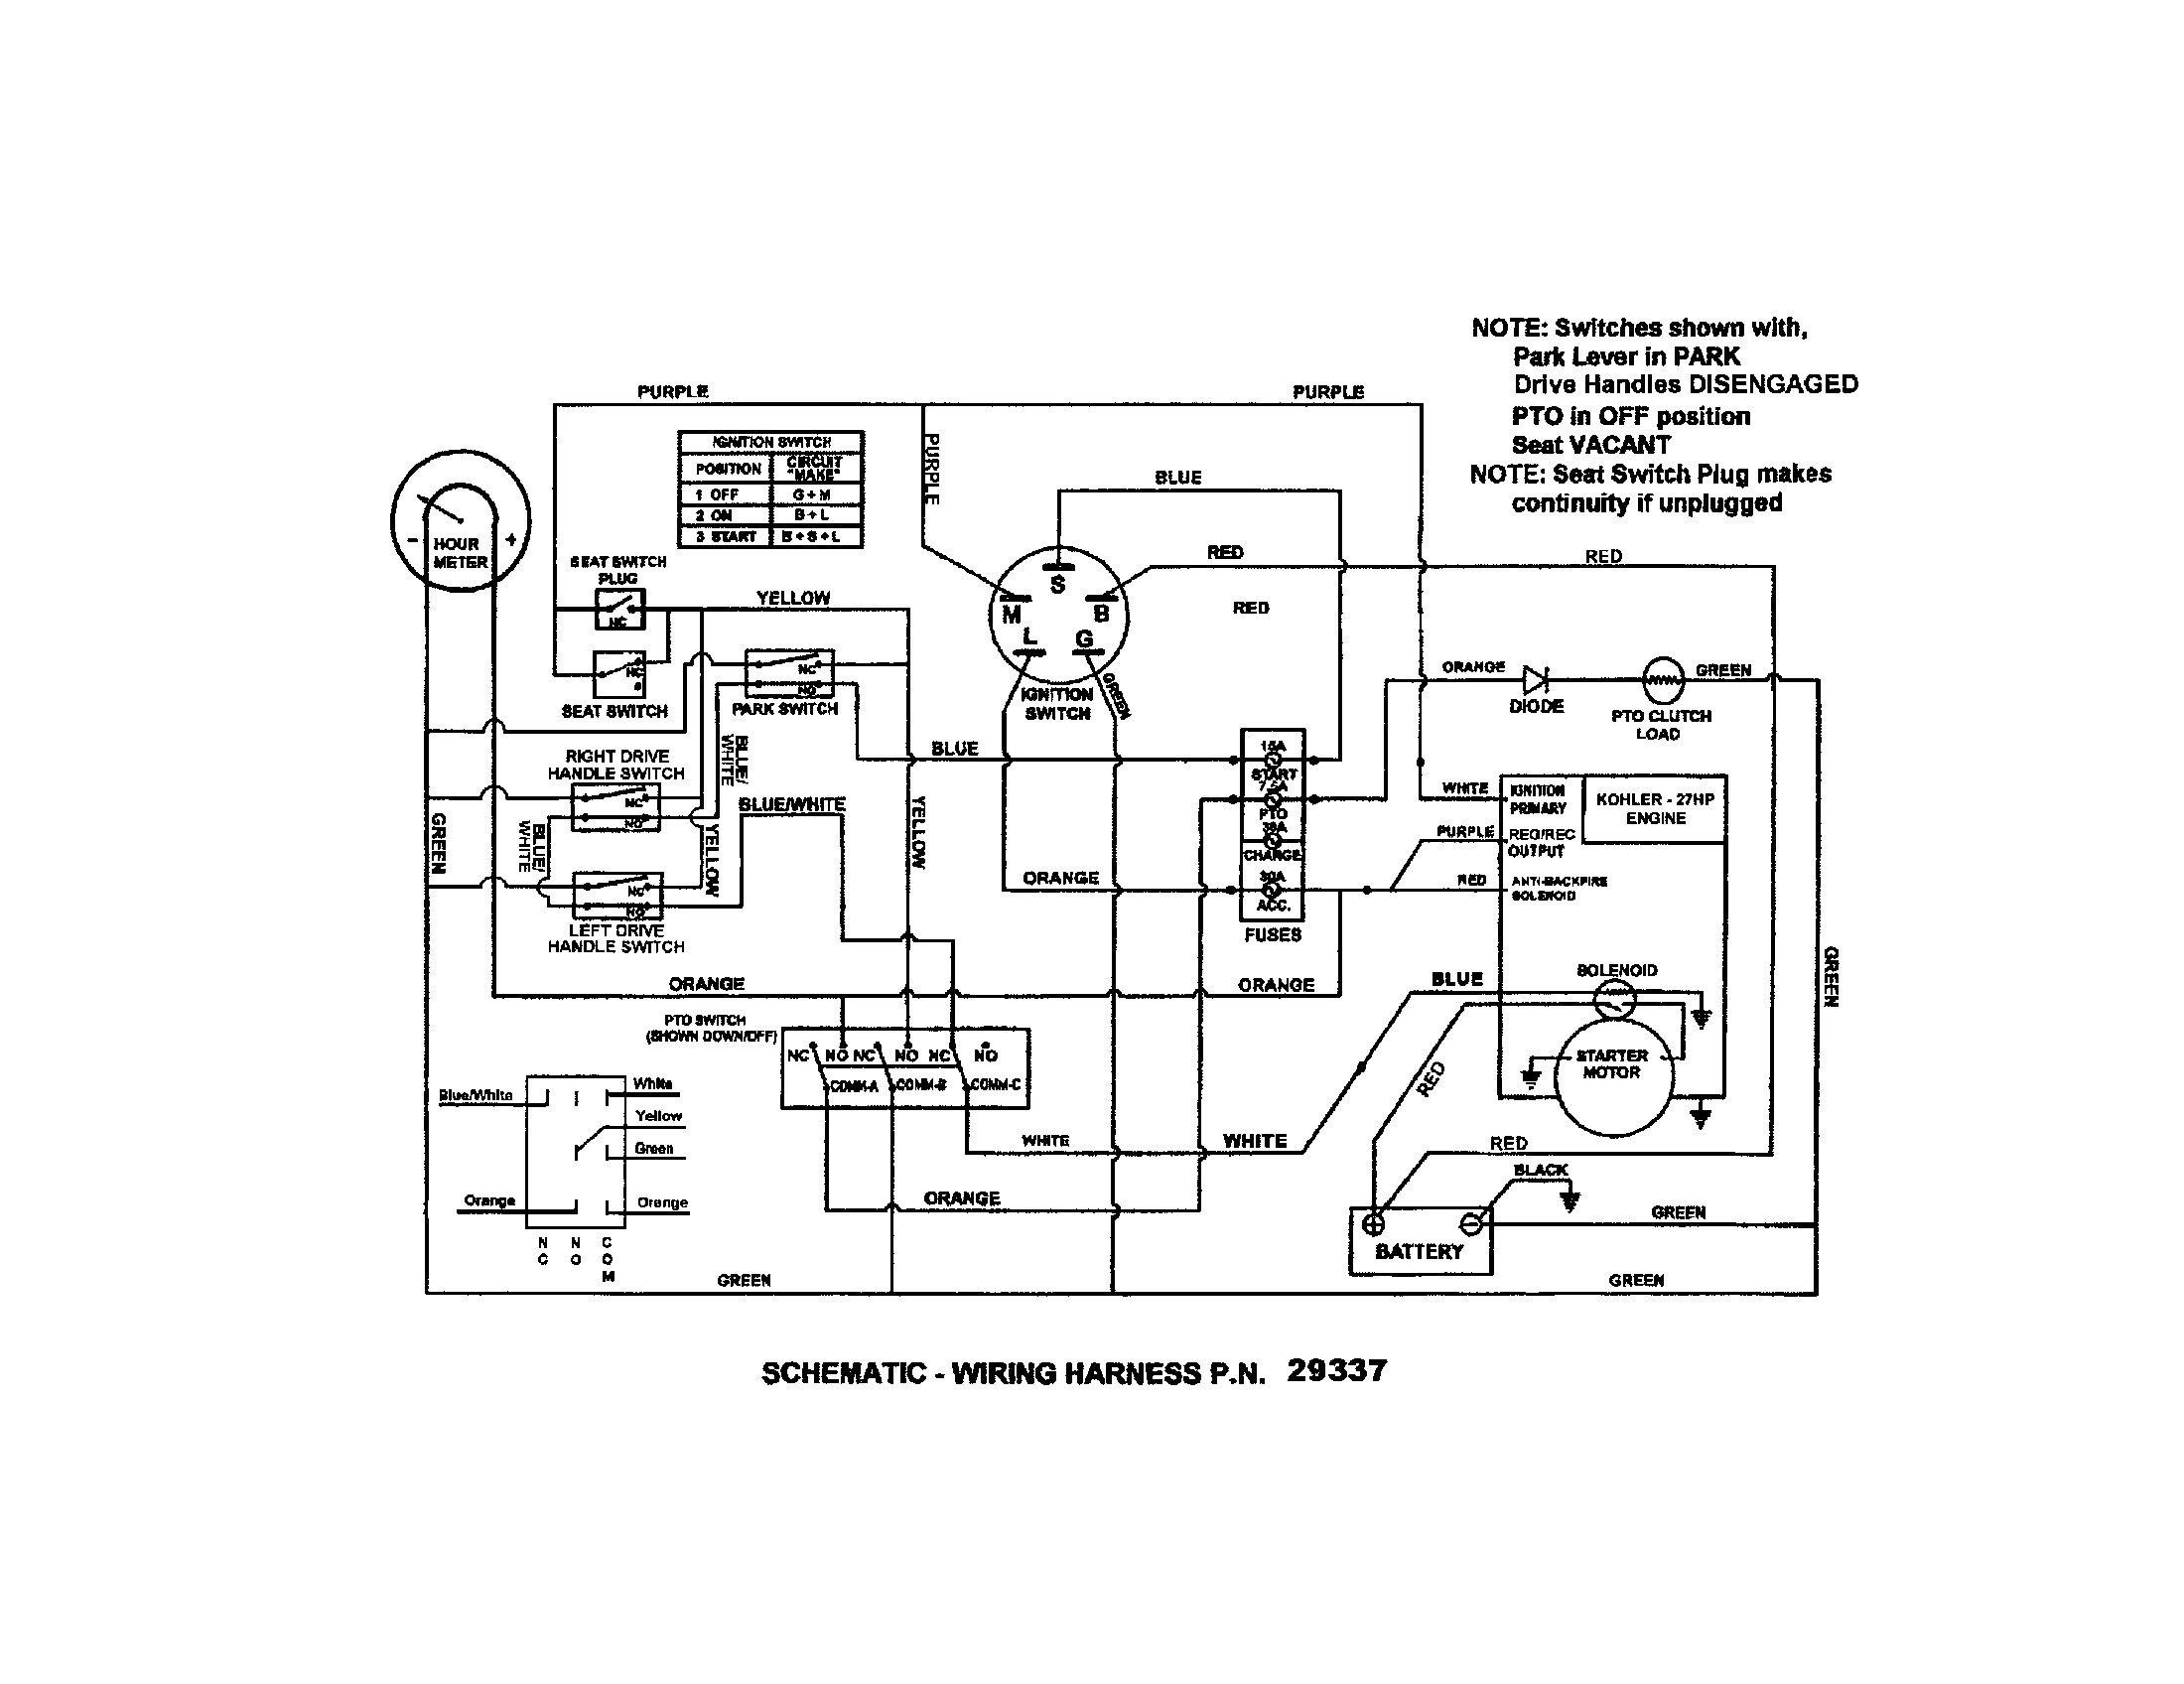 Kohler Ignition Switch Wiring Diagram New Wiring Diagram For Kohler - Kohler Ignition Switch Wiring Diagram